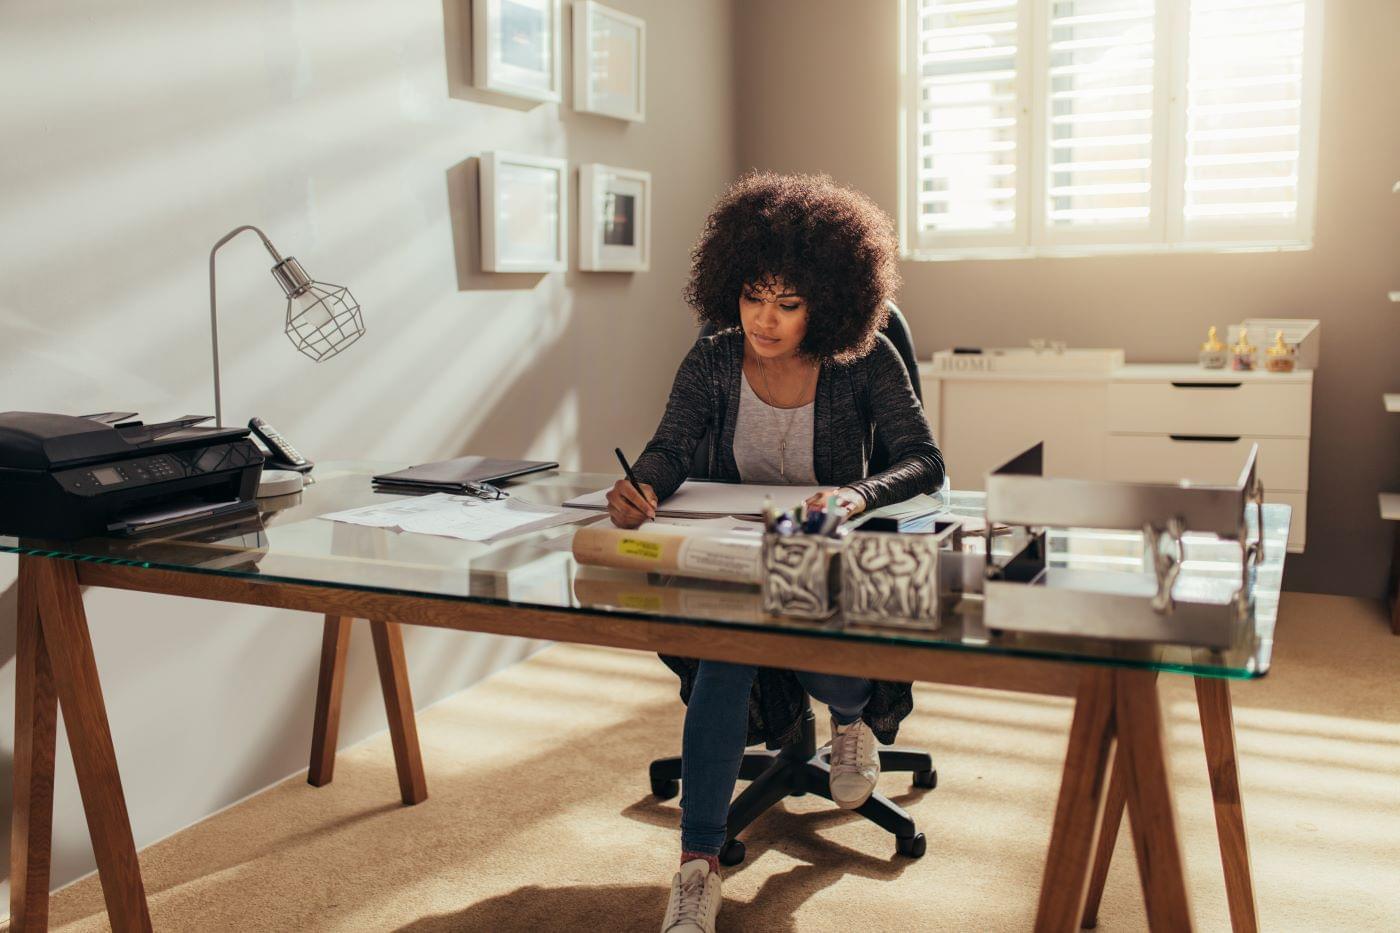 Female business leader working at her desk.